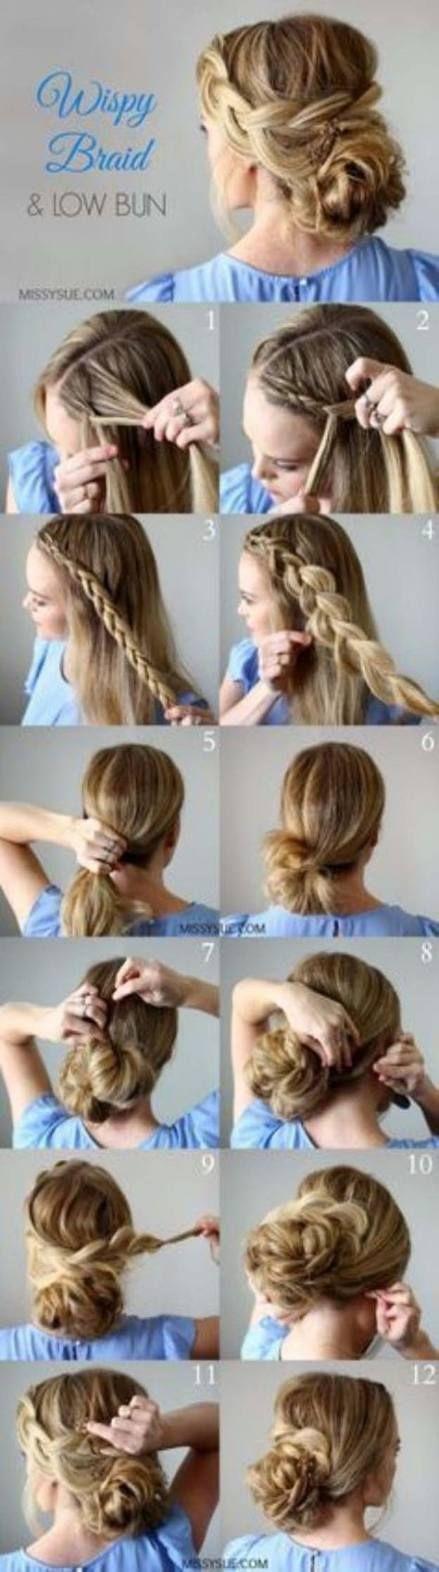 Wedding elegant hairstyles for long hair vintage 53+ new Ideas